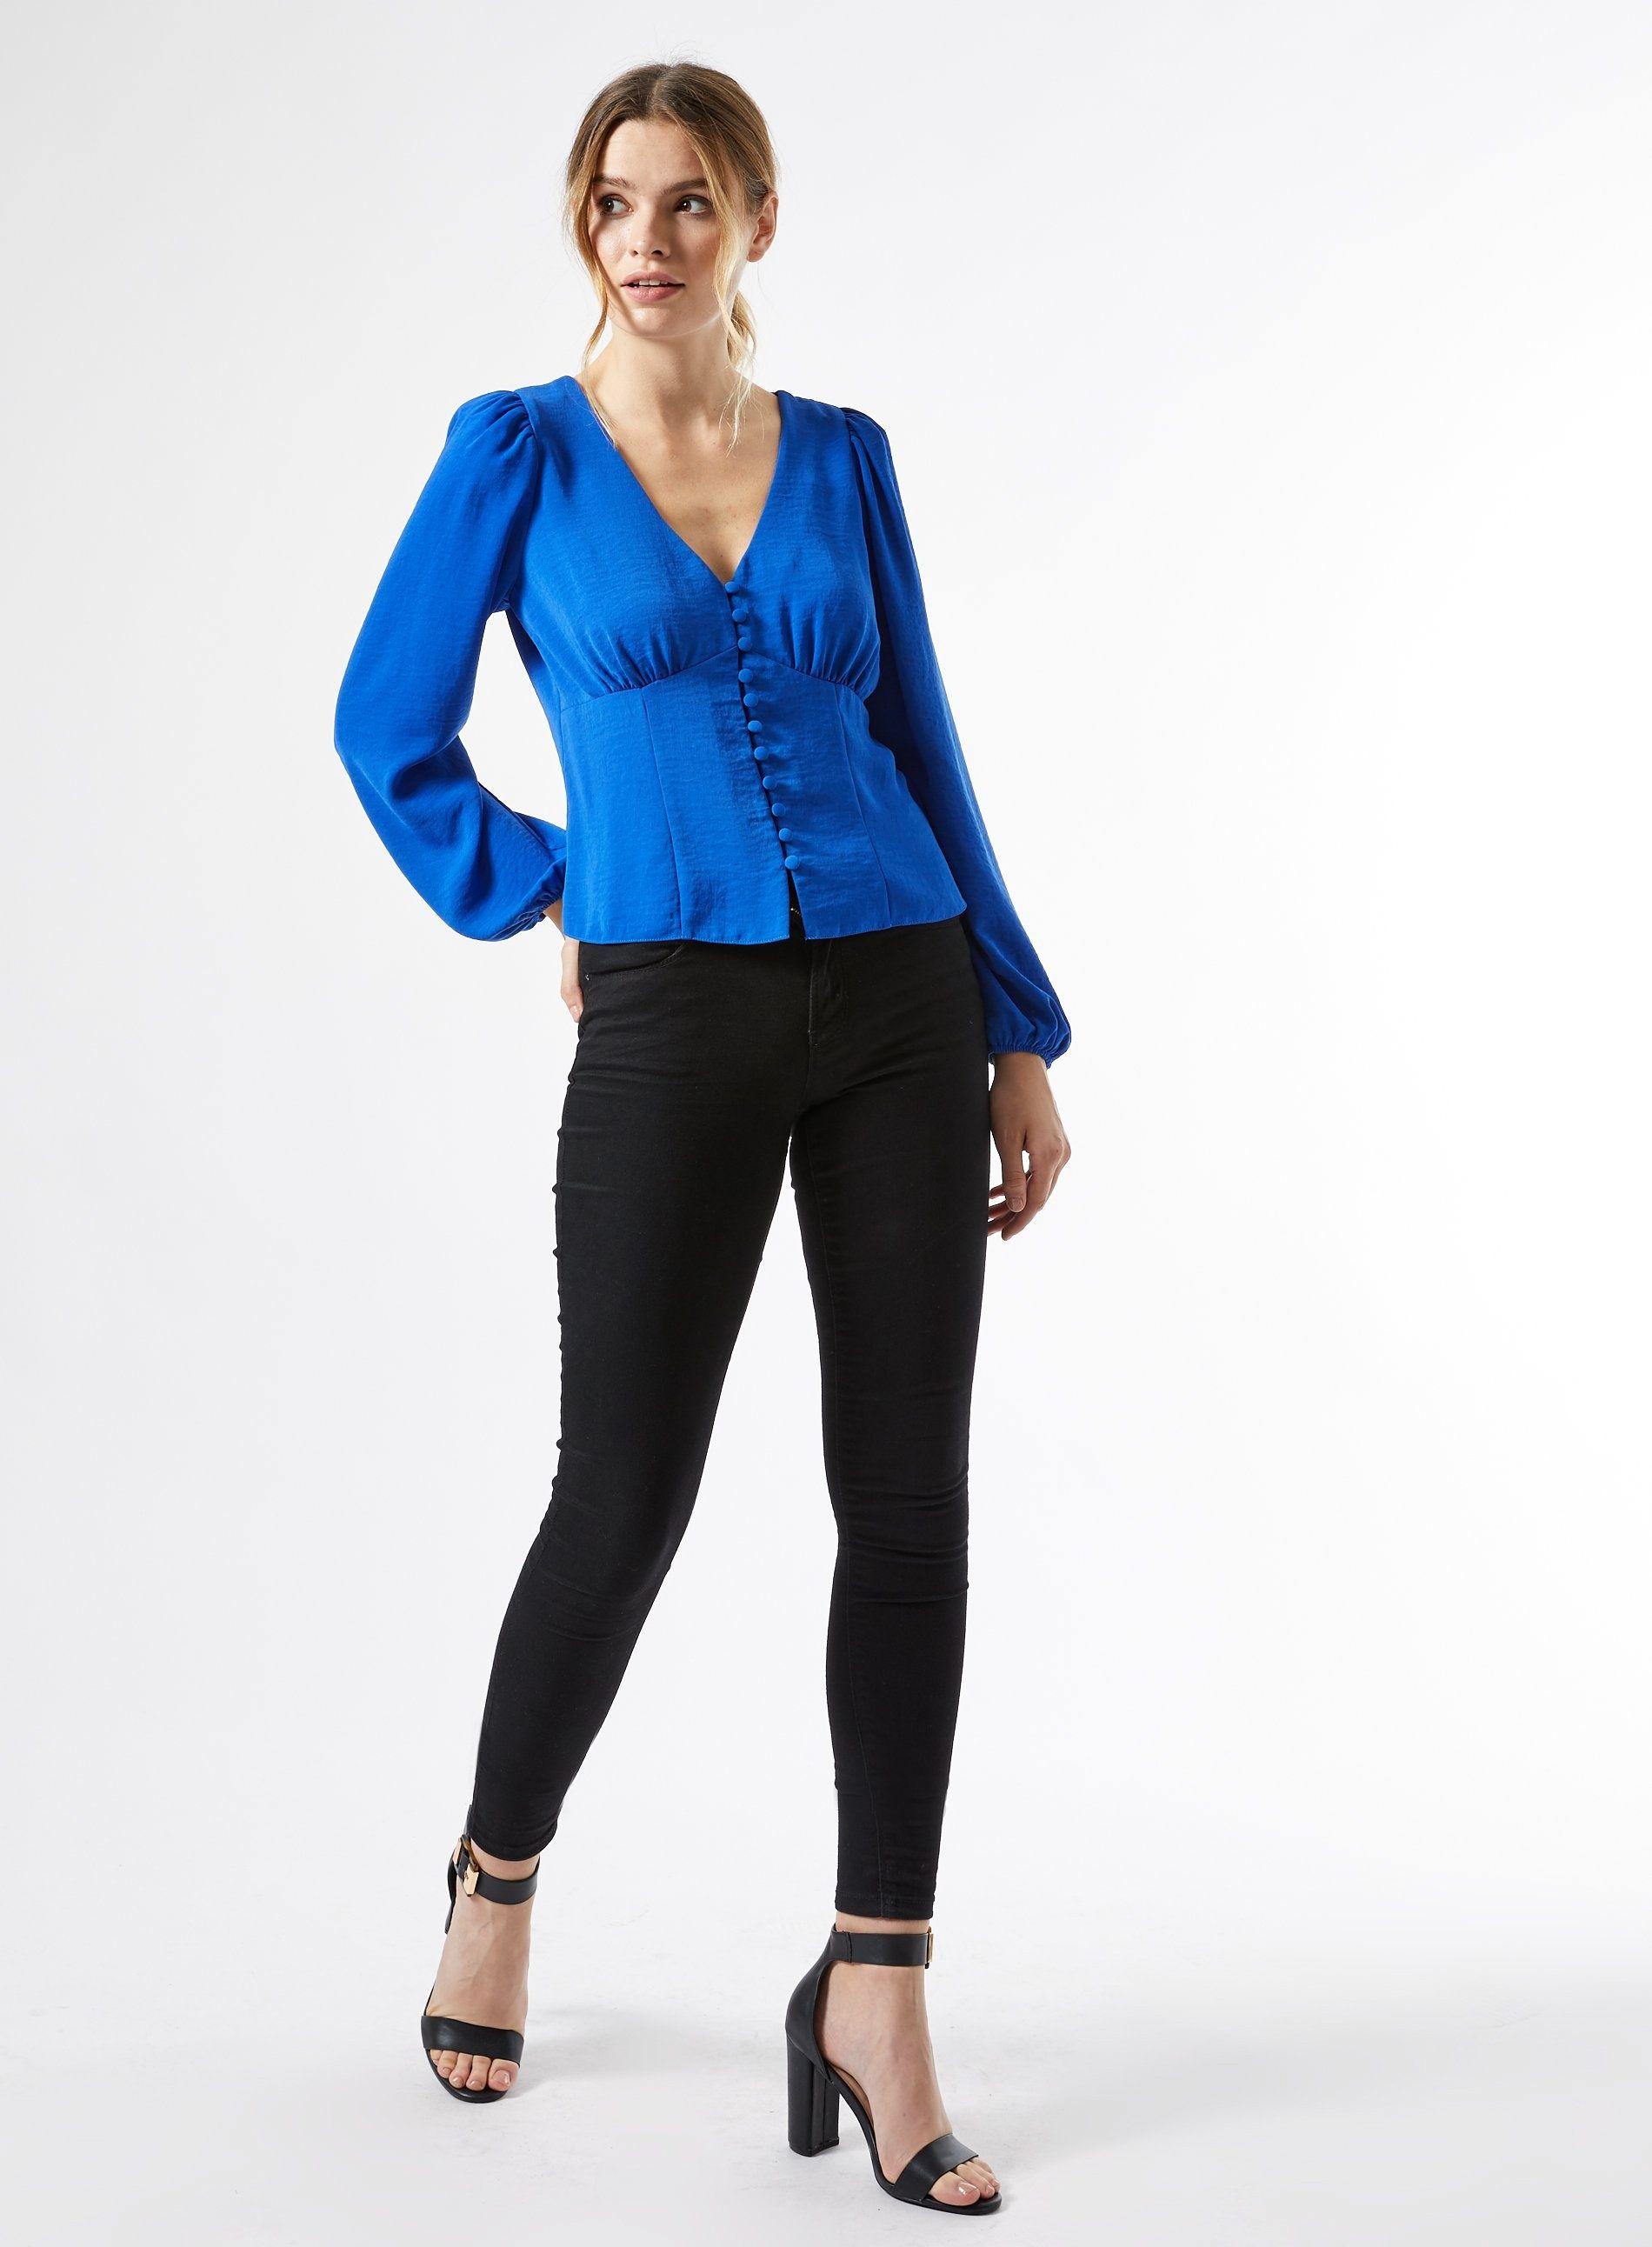 Dorothy Perkins Womens Blue Button Through Top Shirt Blouse V-Neck Long Sleeve